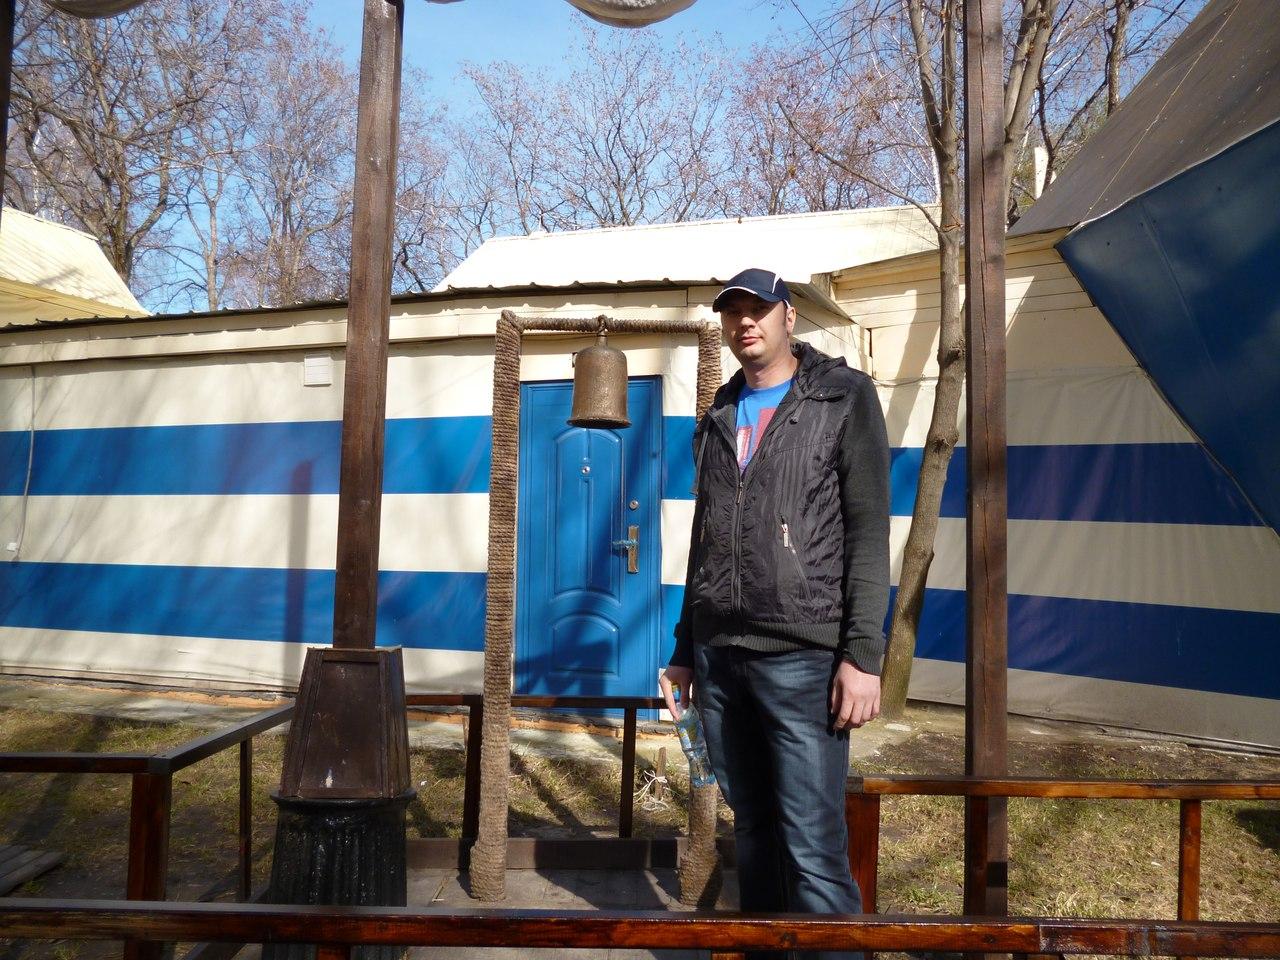 Олег Морозов, Екатеринбург - фото №10